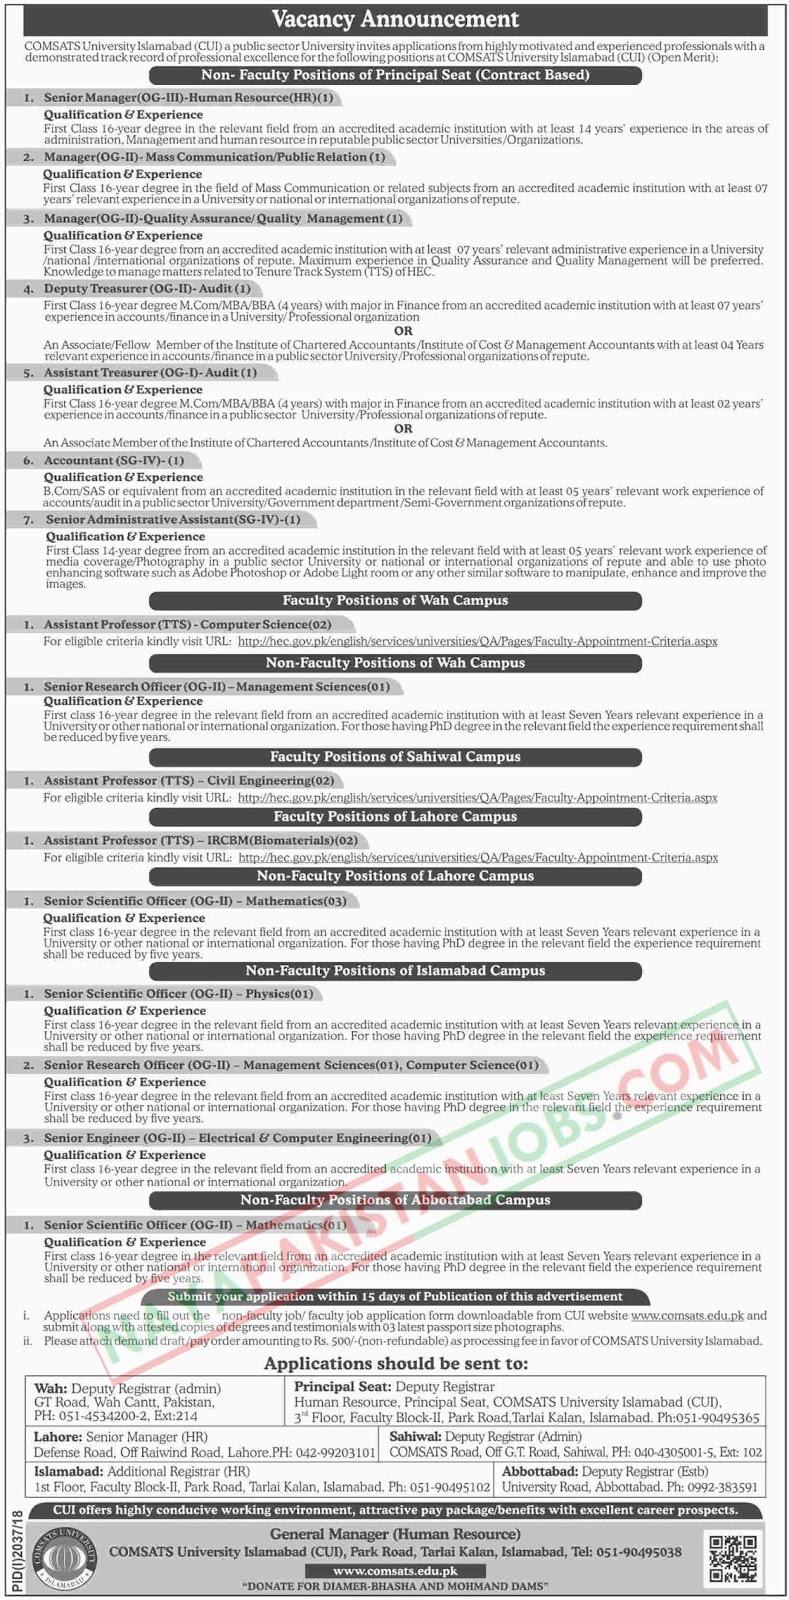 Latest Vacancies Announced in COMSATS University Islamabad 7 November 2018 - Naya Pakistan